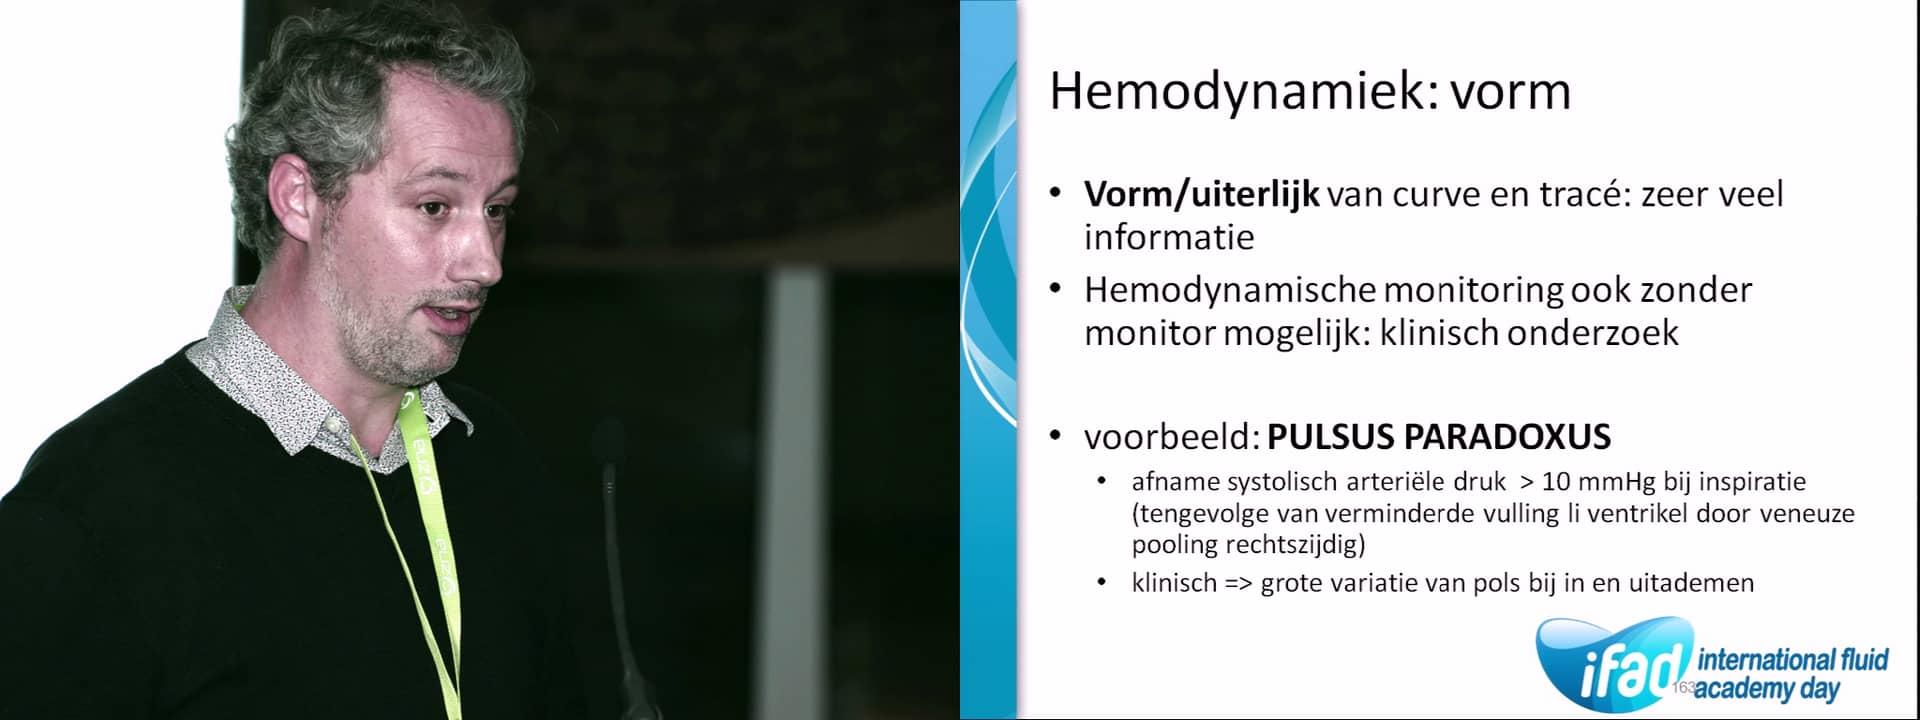 The abnormal hemodynamic parameters